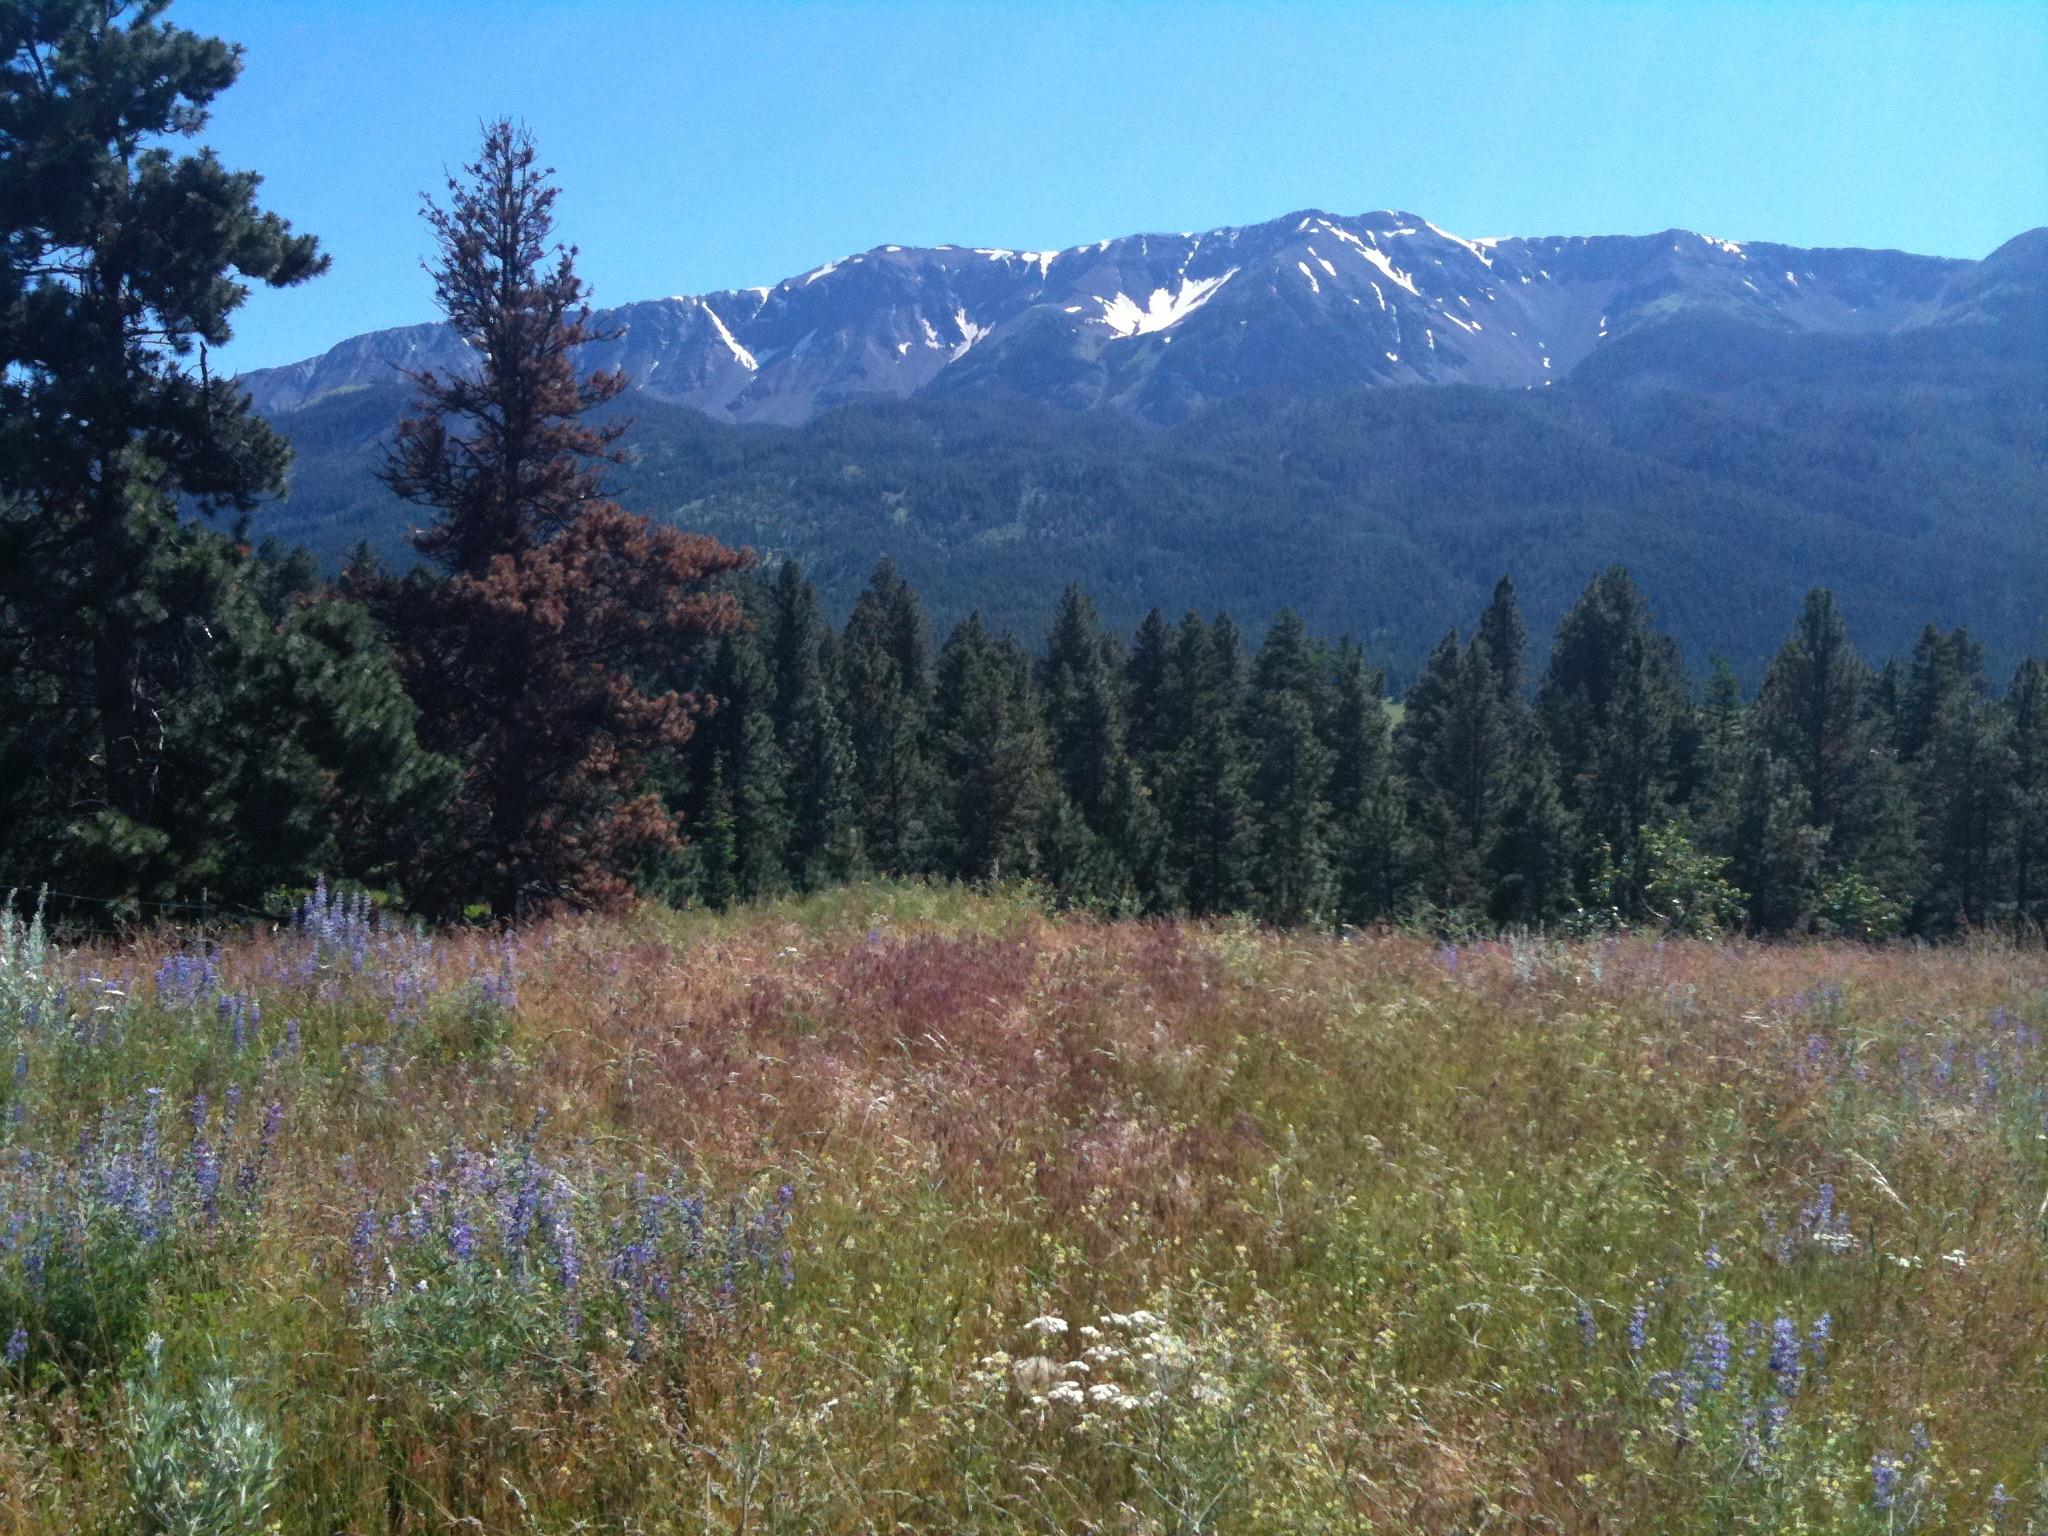 Wallowa Mountains where Joseph (Thunder Rising)'s band lived